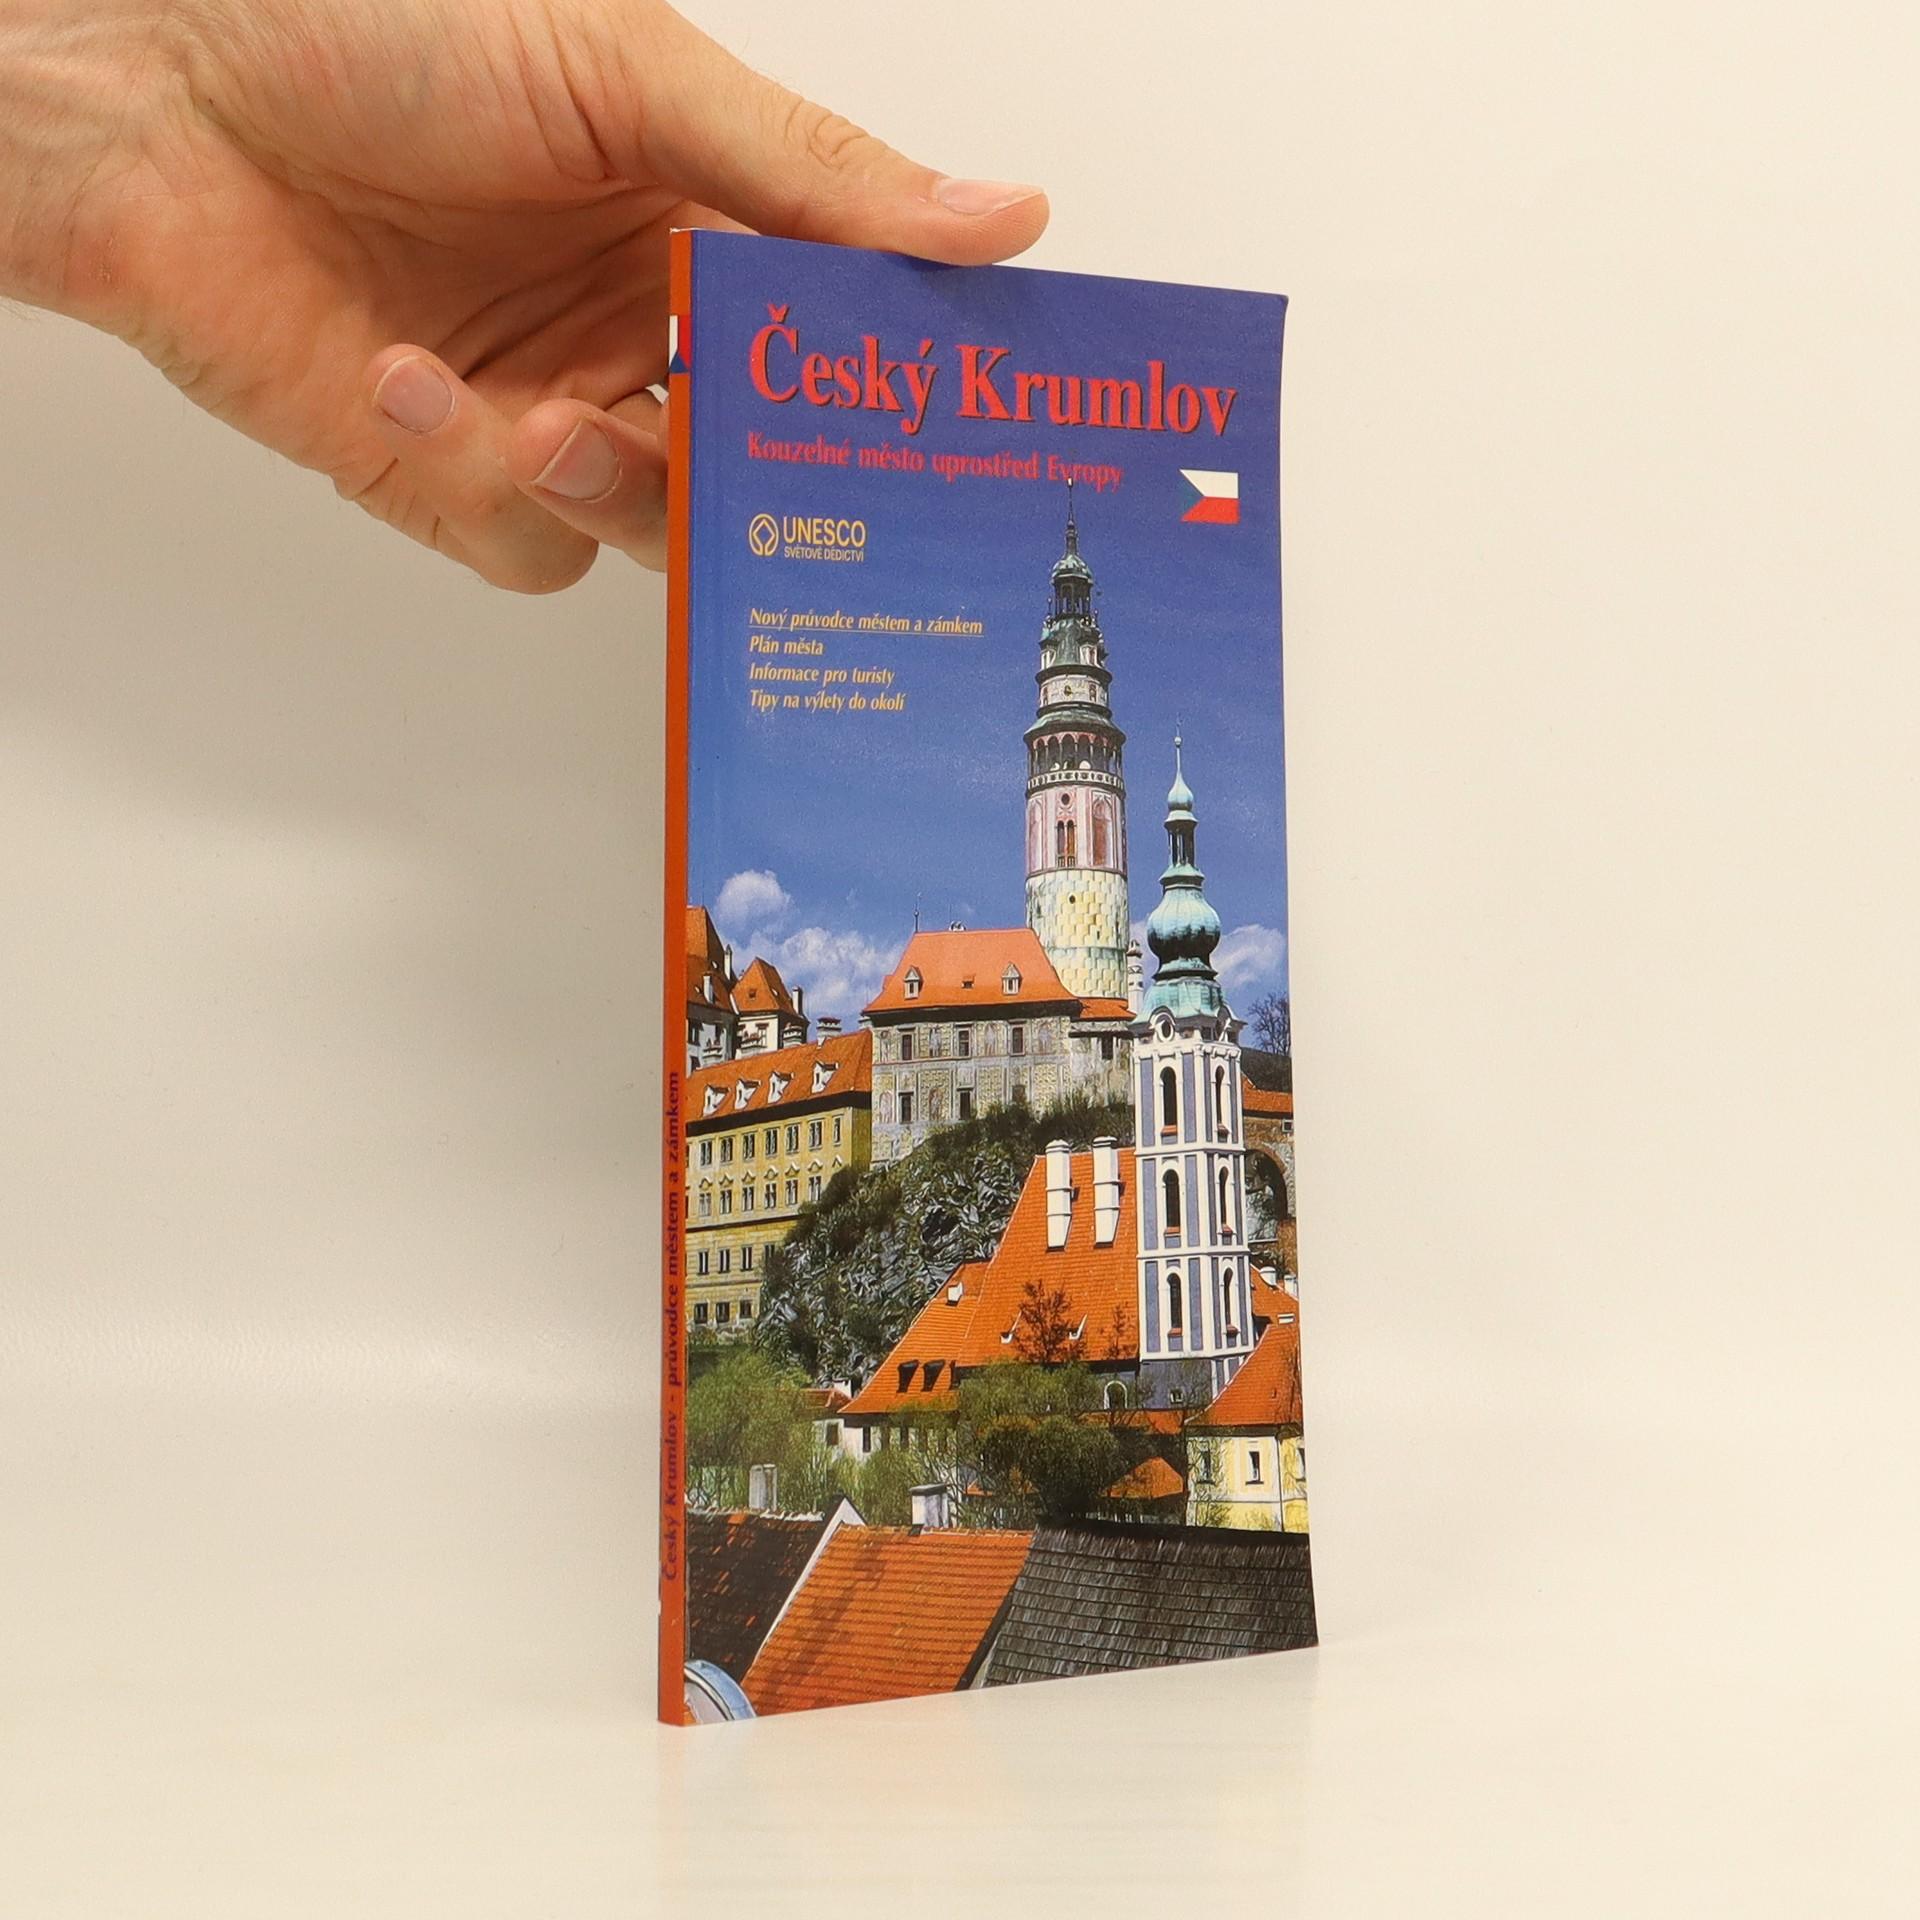 antikvární kniha Český Krumlov, 2001